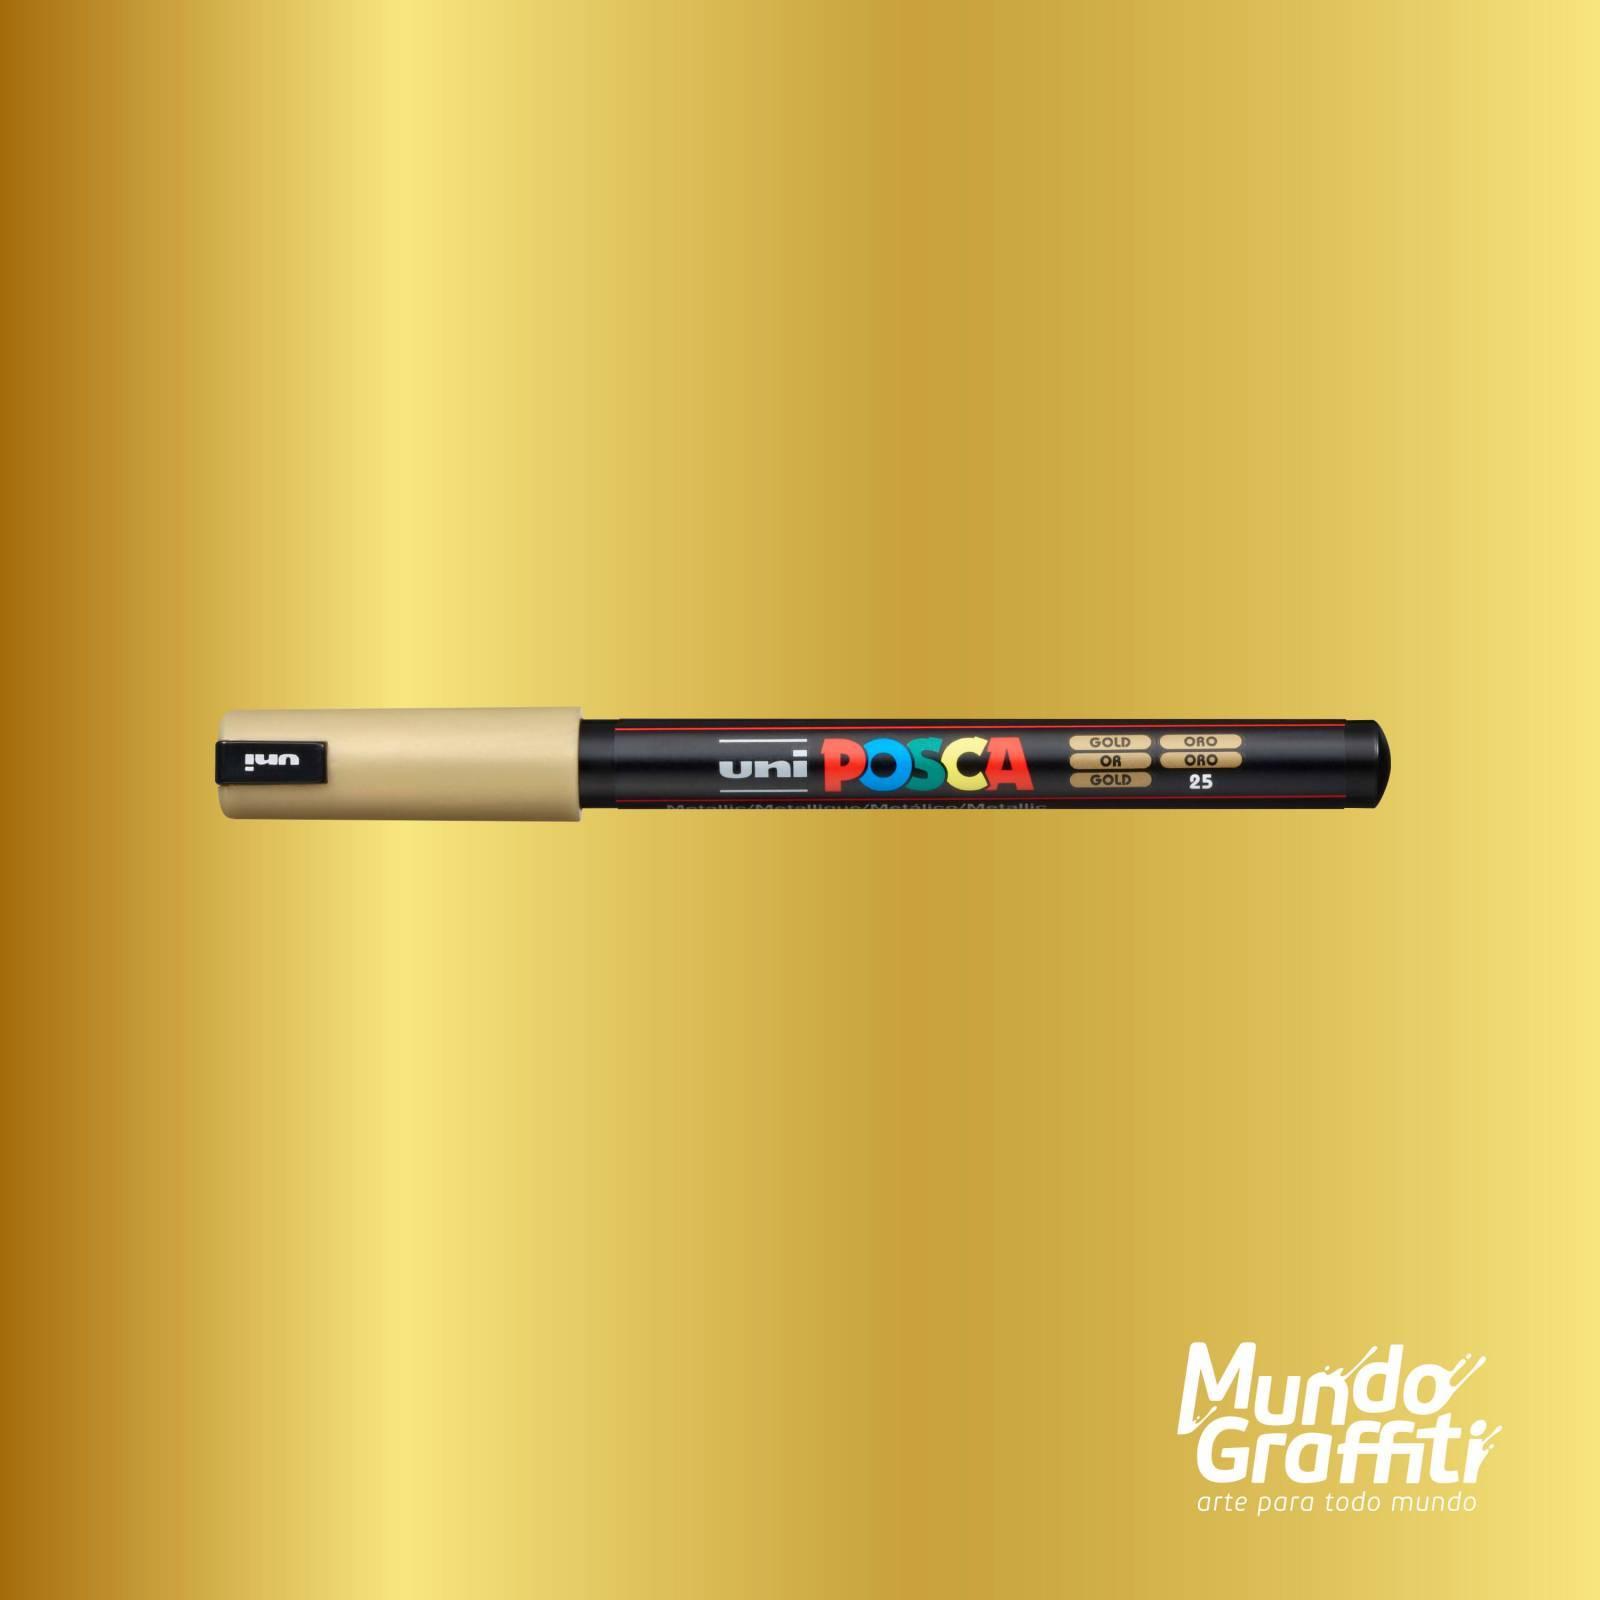 Caneta Posca 1MR Ouro - Mundo Graffiti